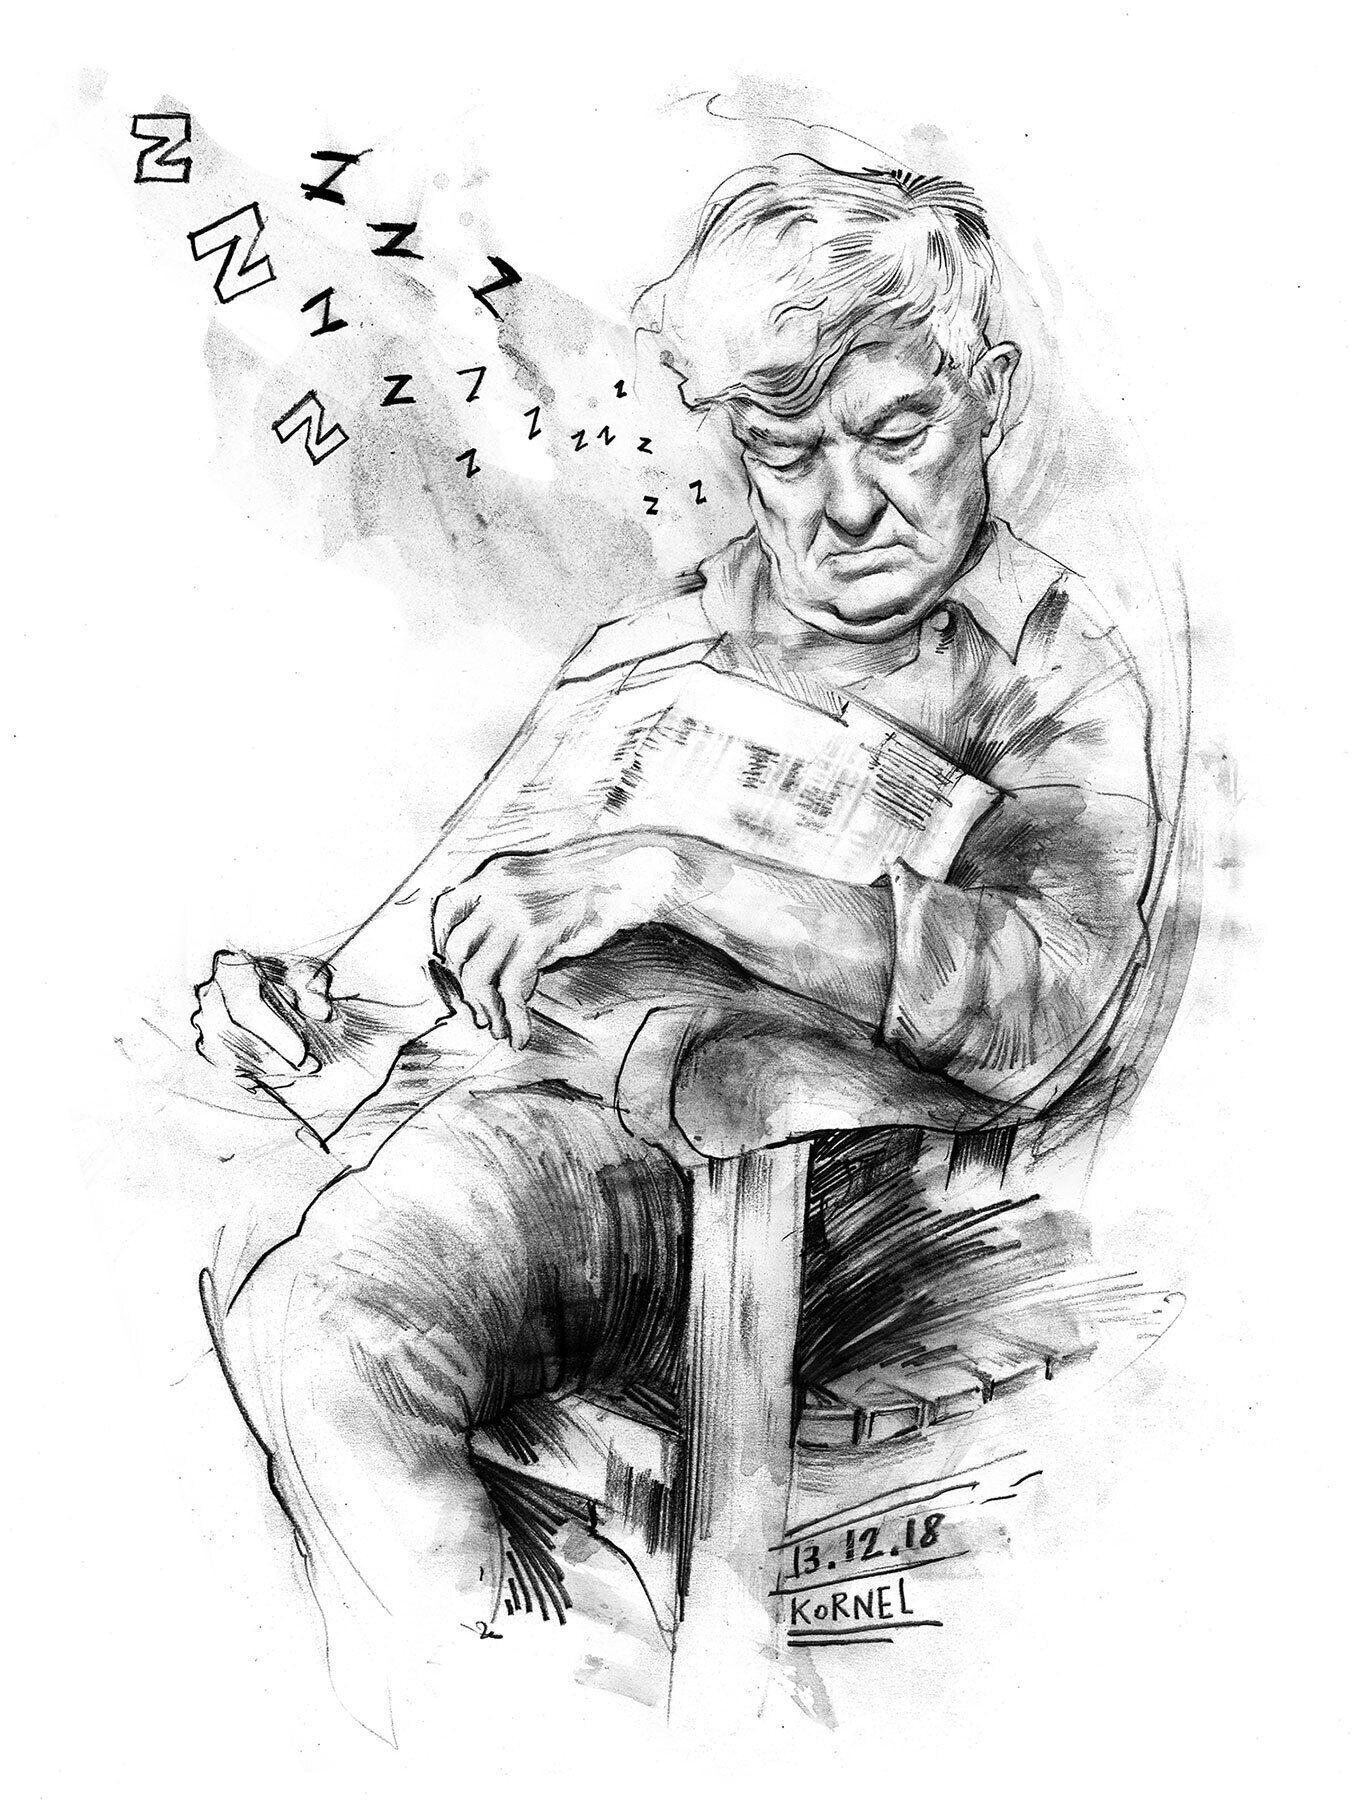 Sleeping man sketch pencil - Kornel Illustration | Kornel Stadler portfolio